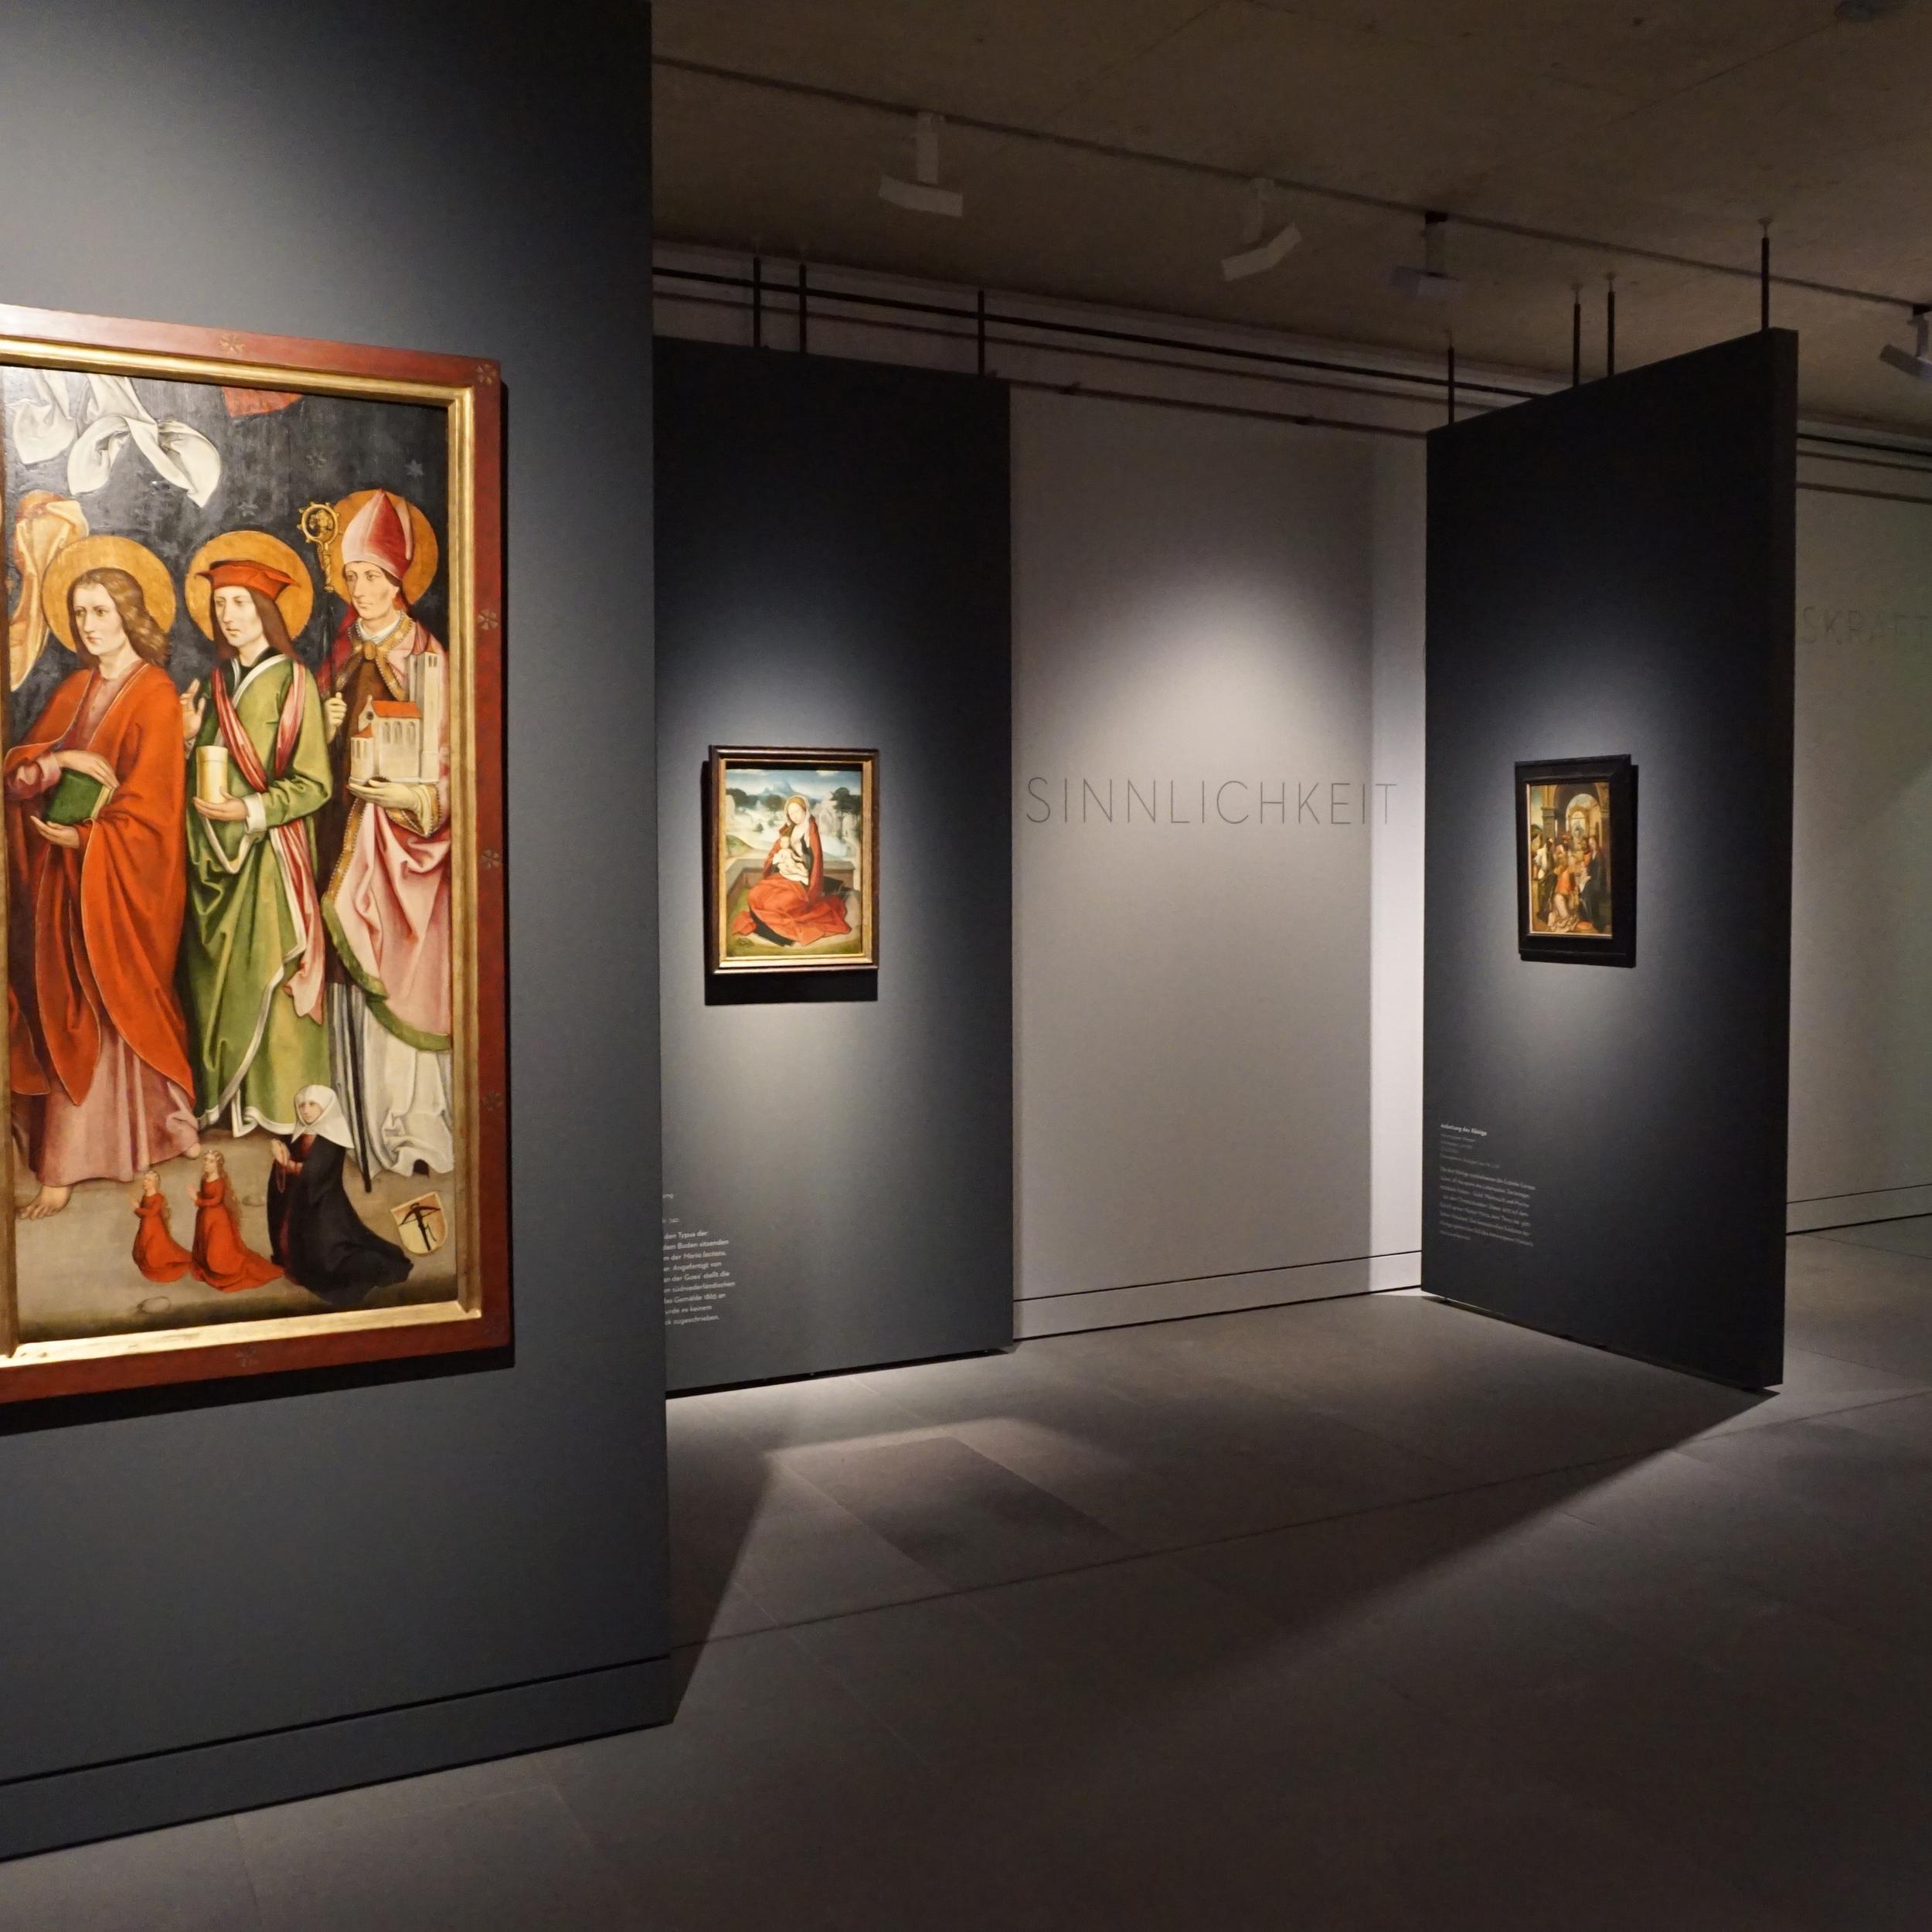 Demirag-Architekten-Diözesan-museum-johann-baptist-hirscher-glaube-kunst-hingabe-eroeffnung-04.jpg